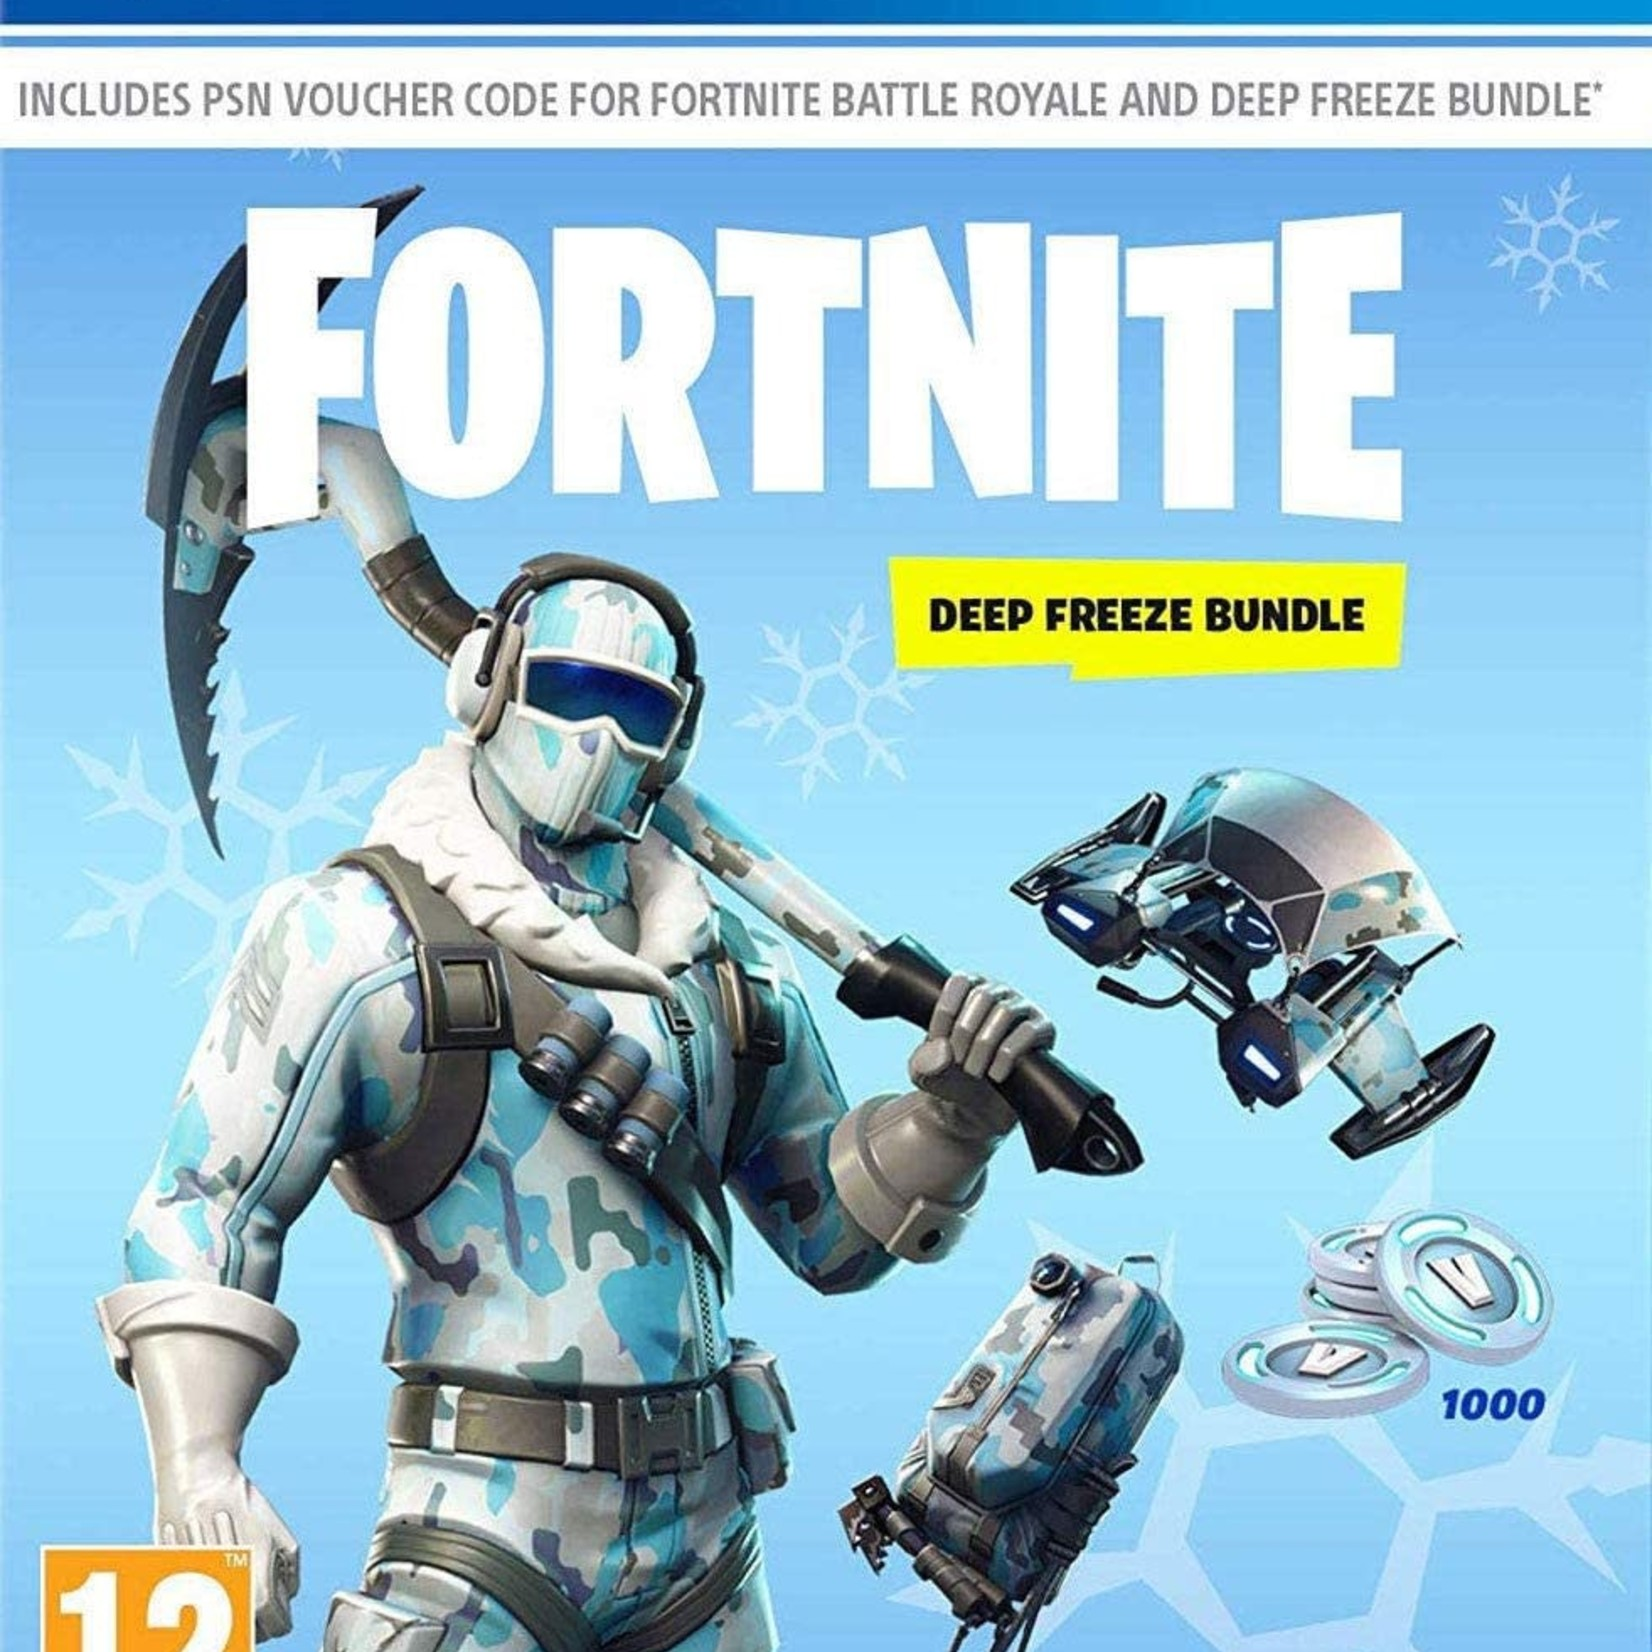 PS4 Fortnite Deep Freeze bundle (download code)